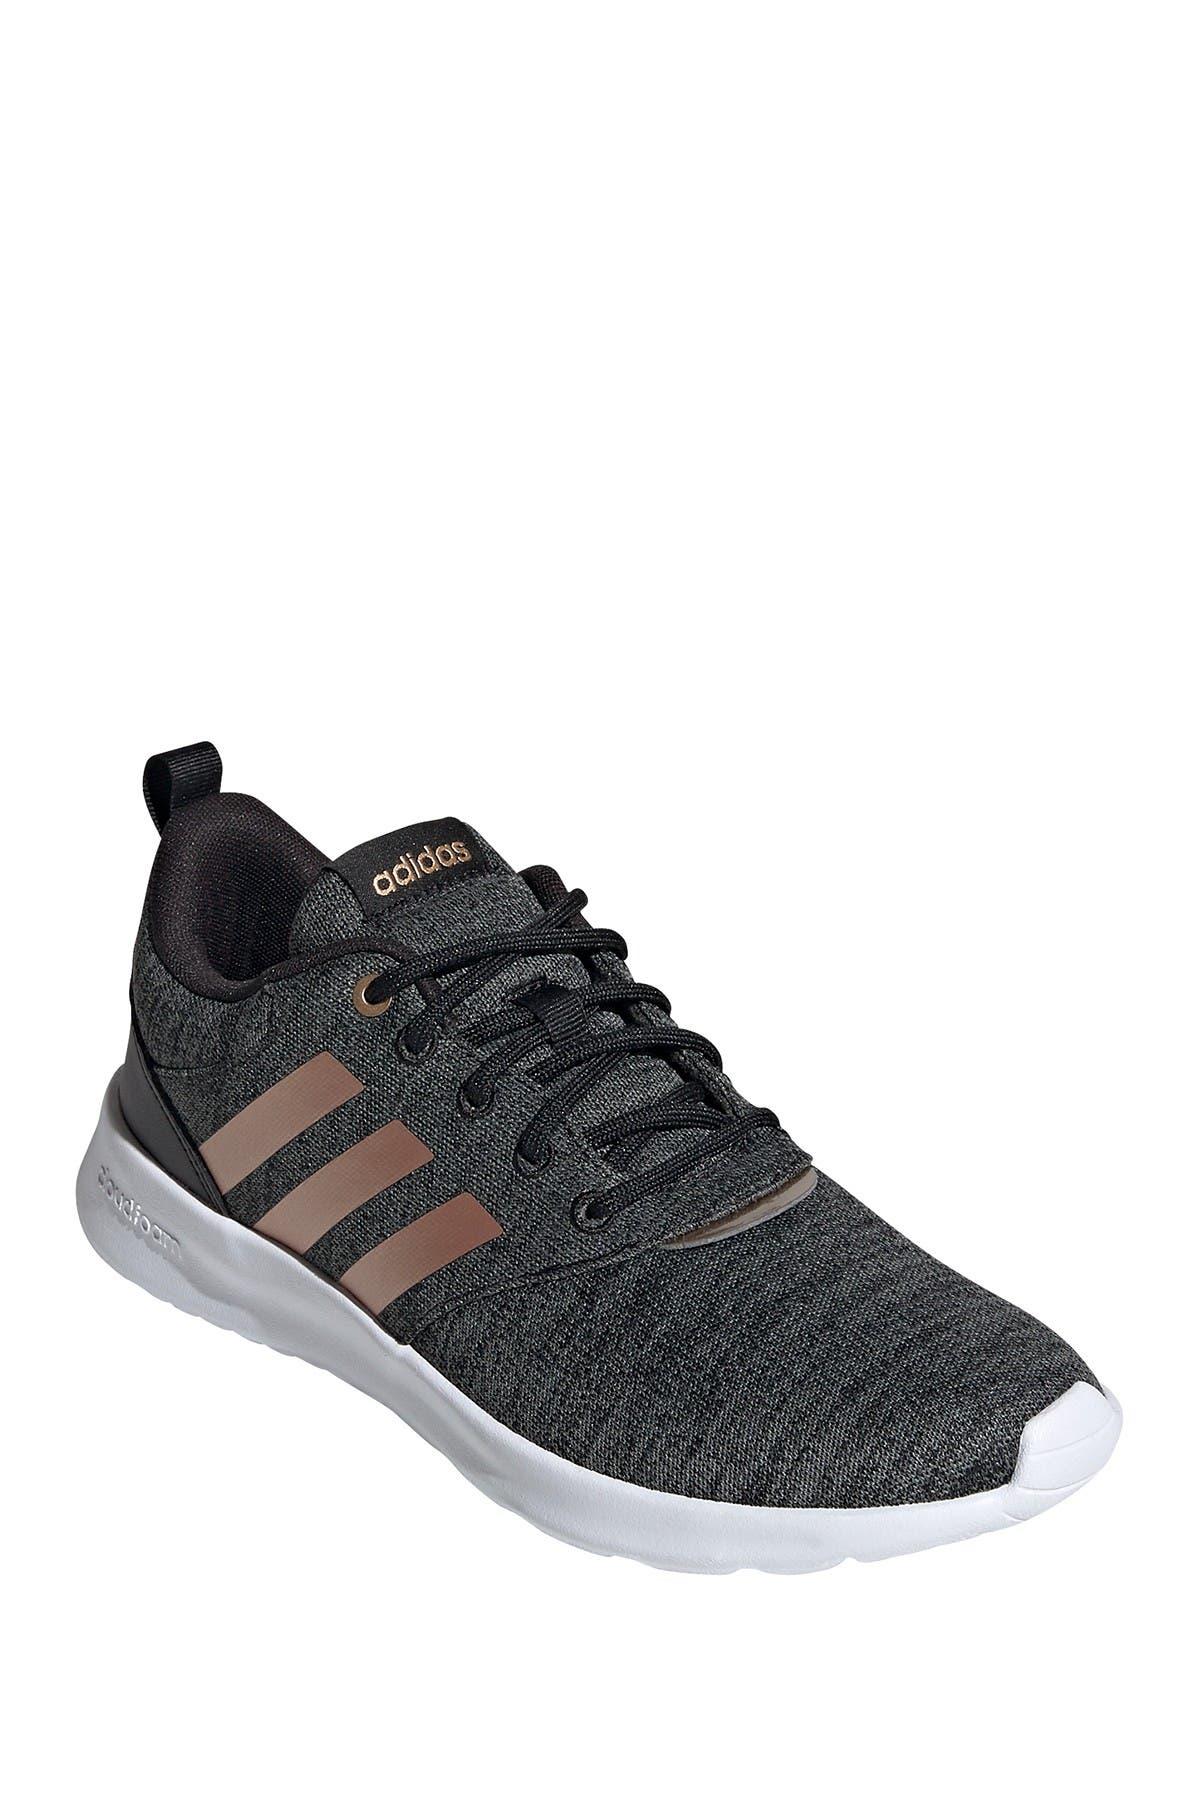 Image of adidas QT Racer 2.0 Running Shoe